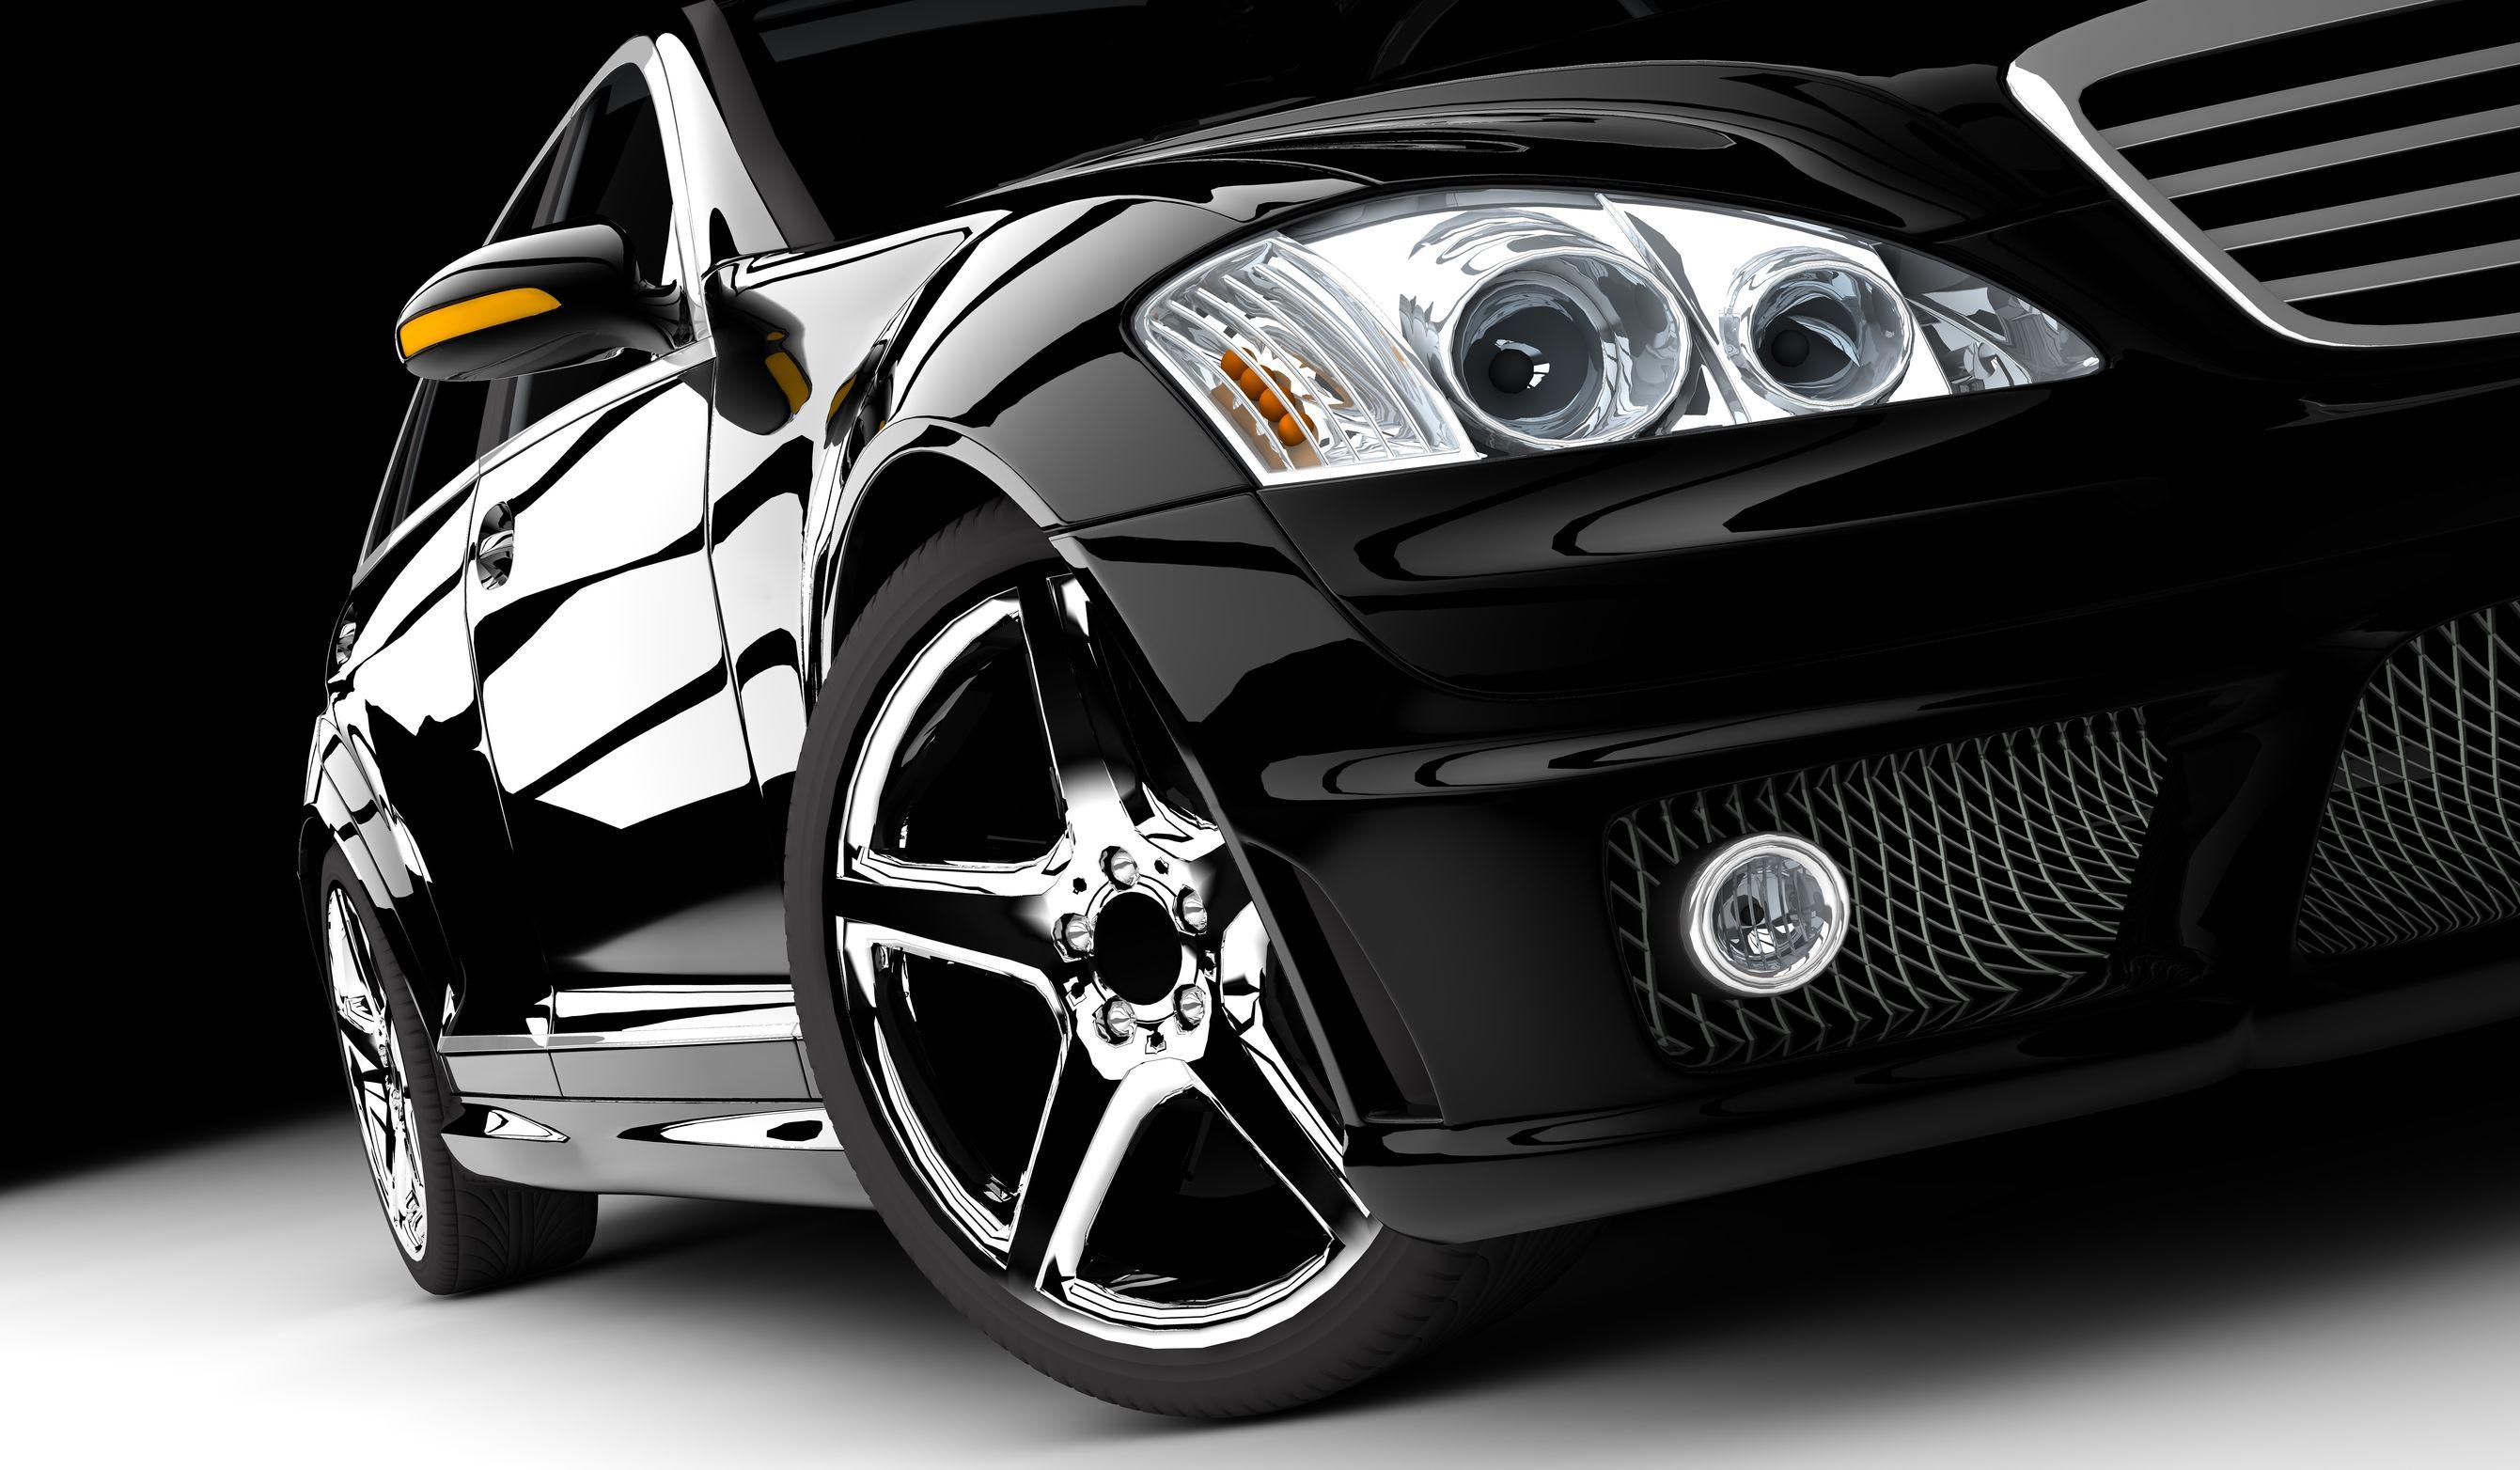 Fleet Vehicle Graphics: An Effective Advertising Method